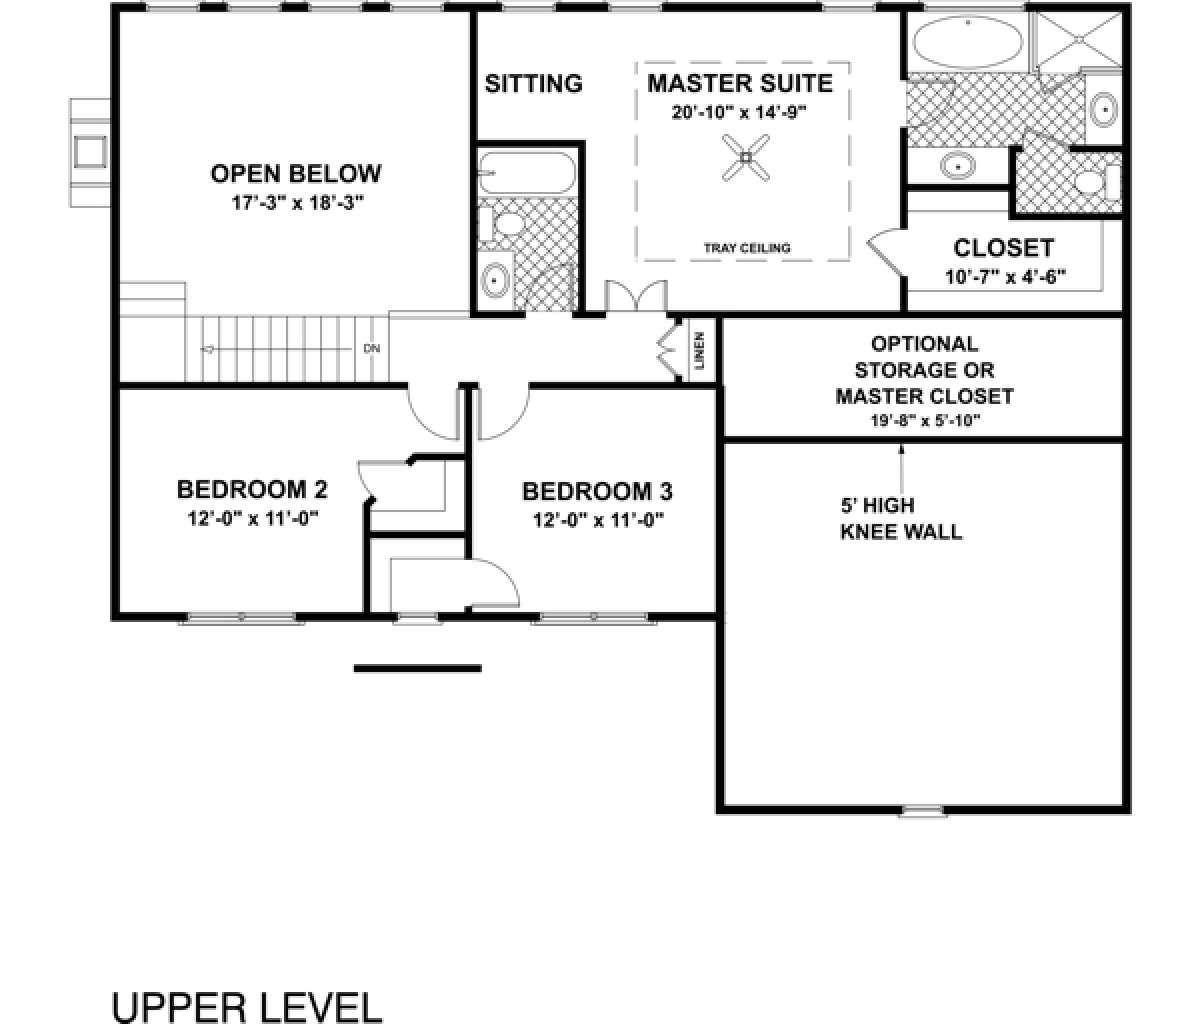 Colonial Plan: 2,097 Square Feet, 4 Bedrooms, 3 Bathrooms - 036-00086